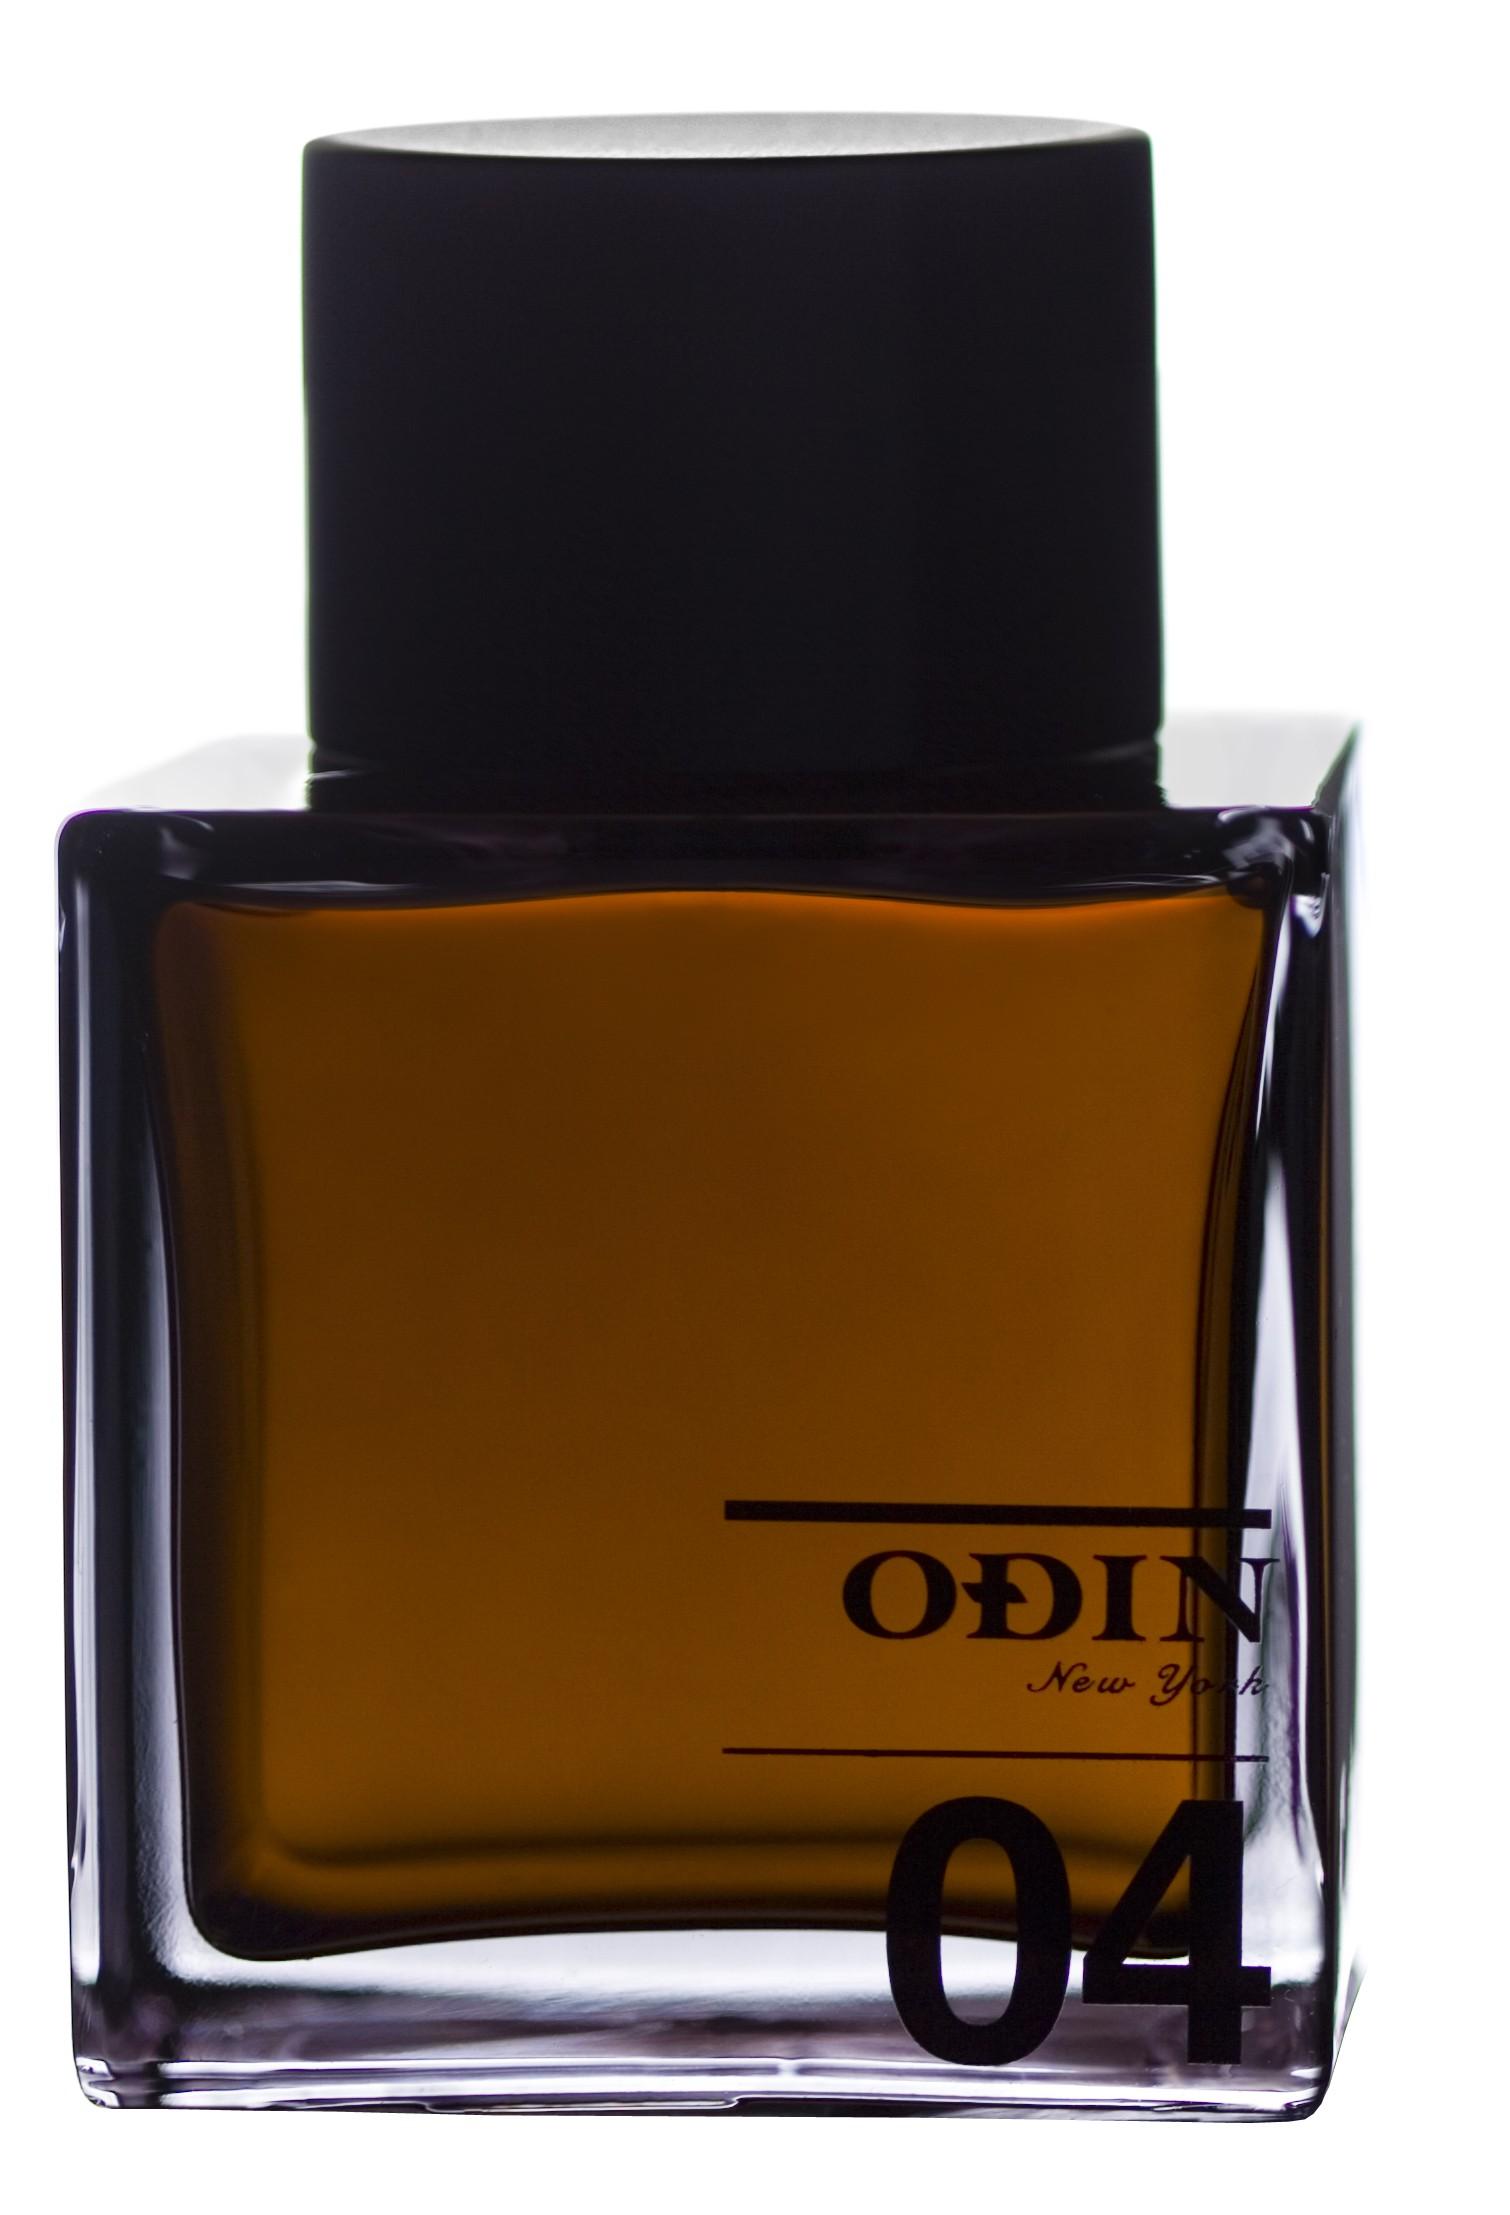 Odin New York 04 Petrana аромат для мужчин и женщин